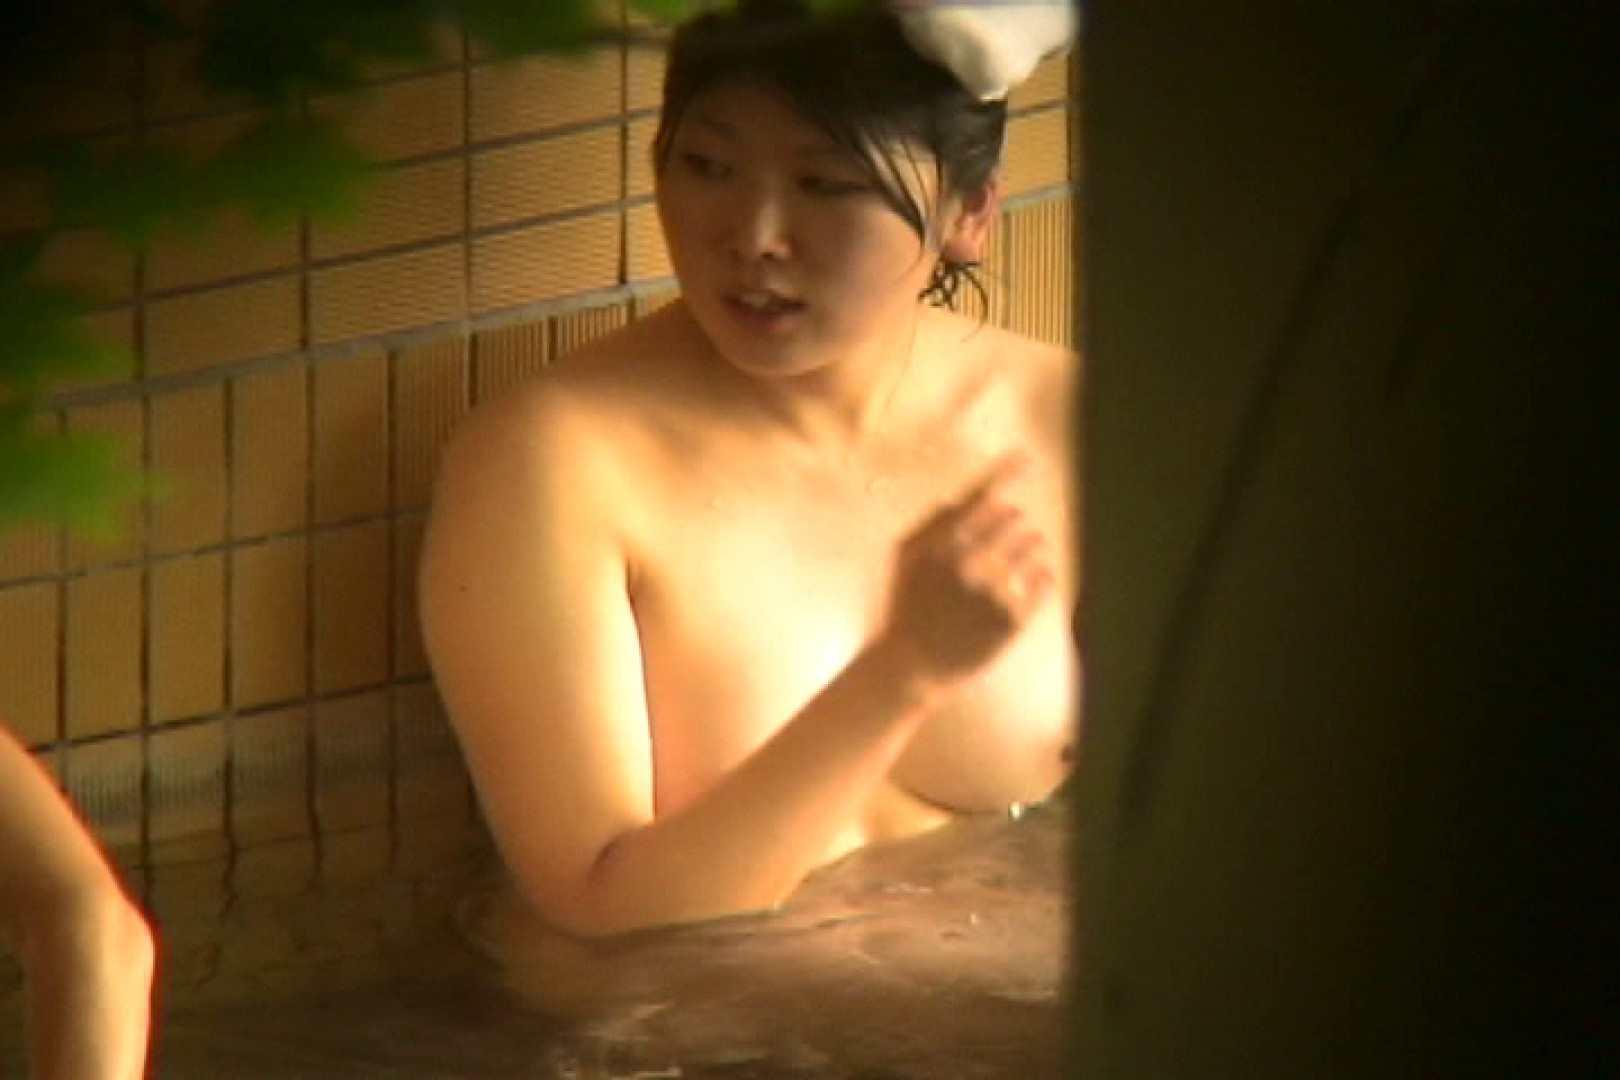 Aquaな露天風呂Vol.704 盗撮師作品  75pic 54